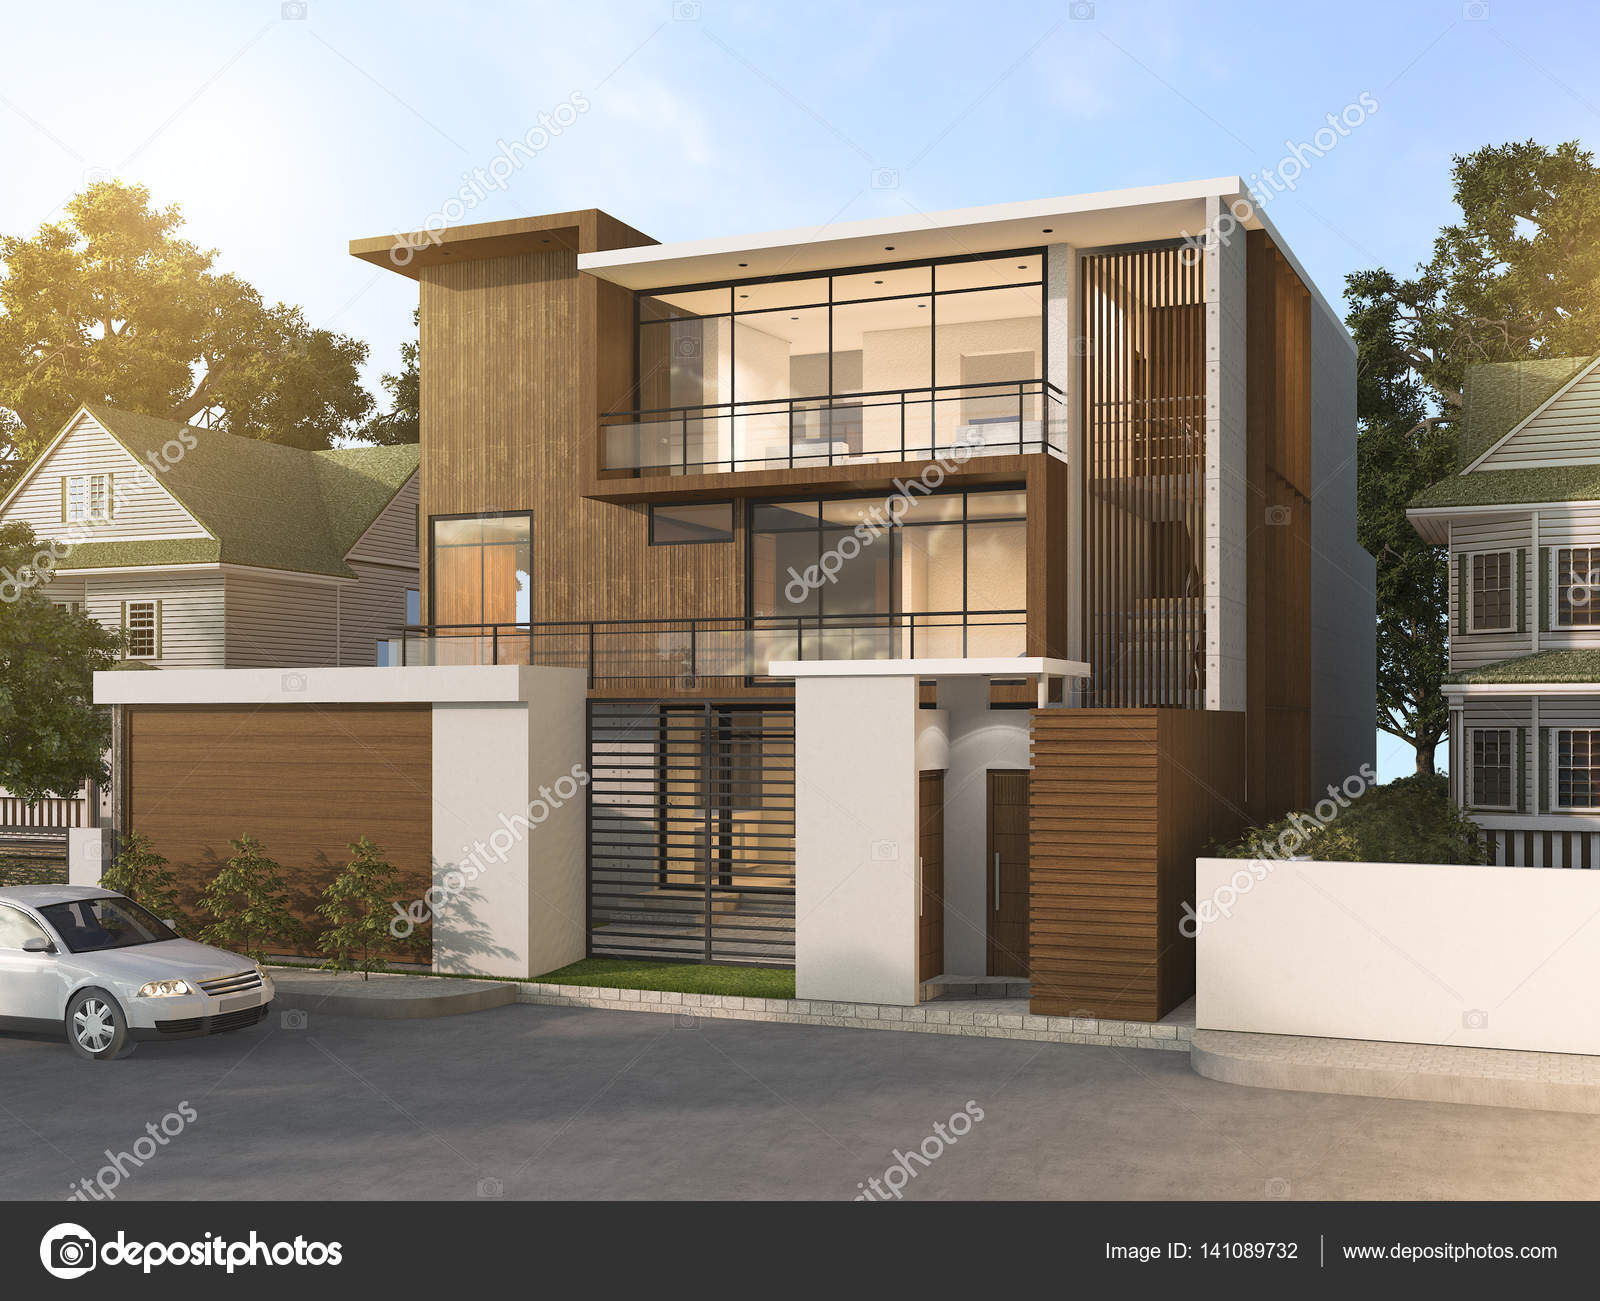 D rendering mooie moderne stijl hout huis in mooie streek